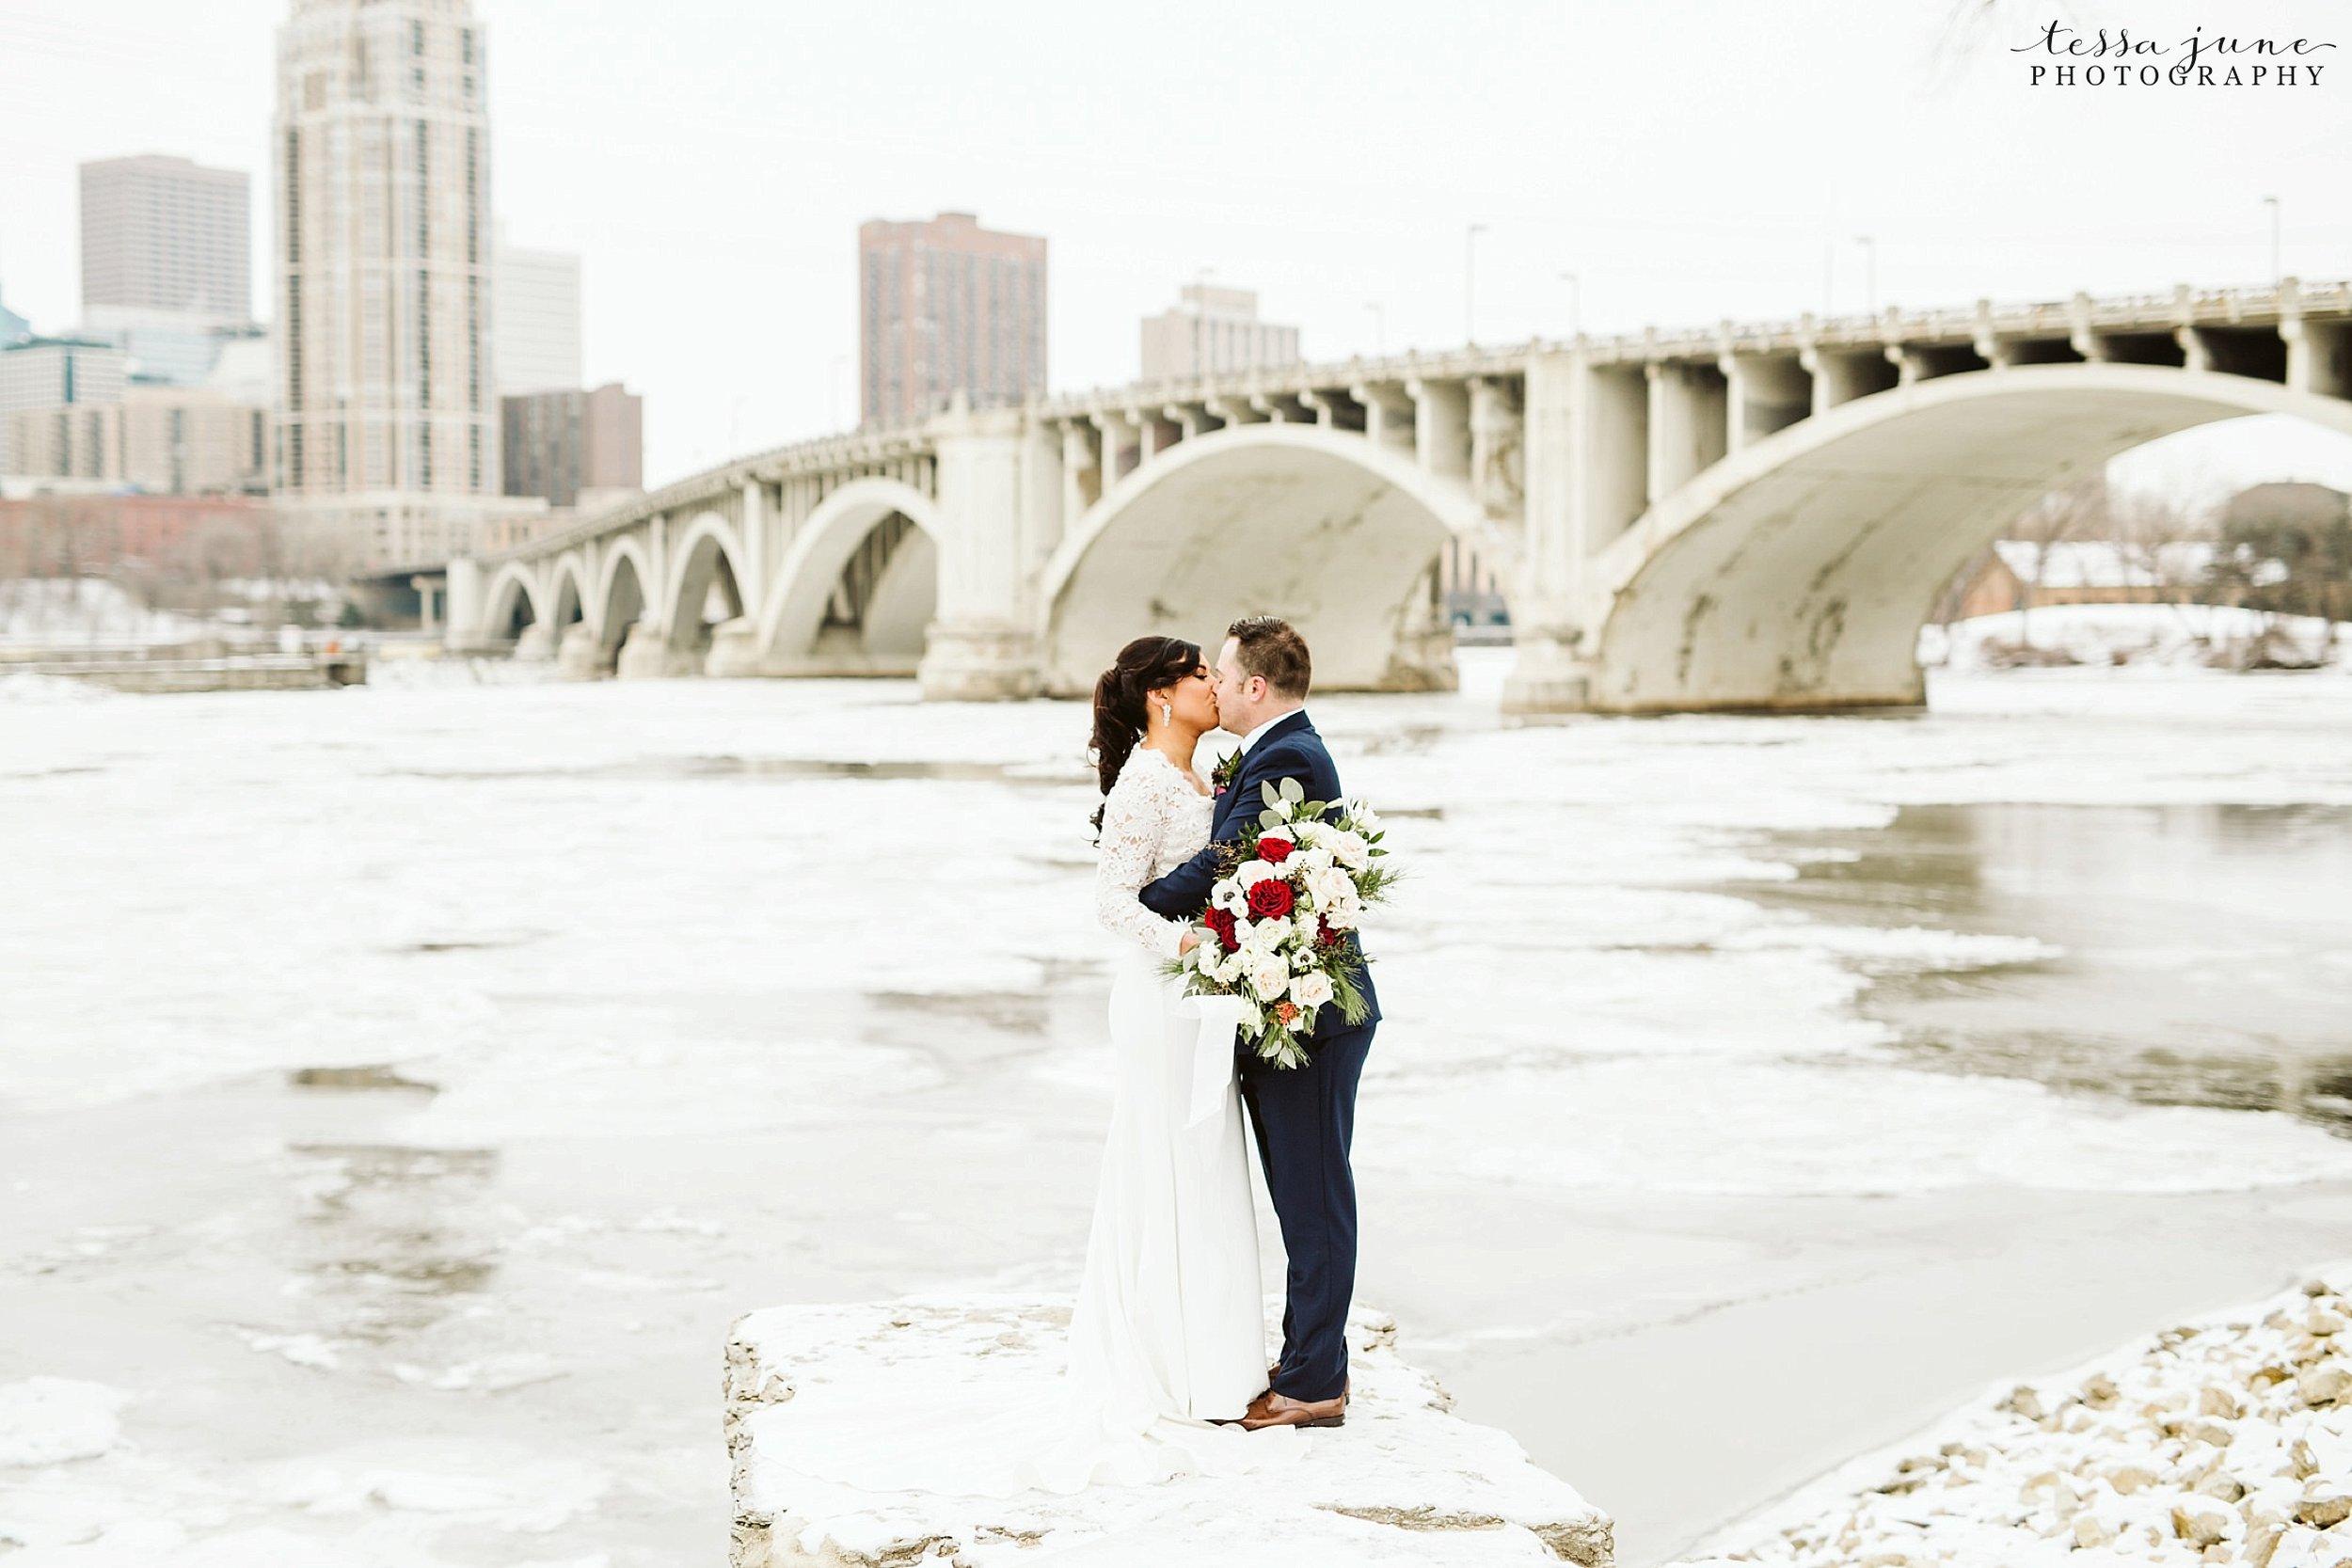 minneapolis-event-center-winter-romantic-snow-wedding-december-102.jpg